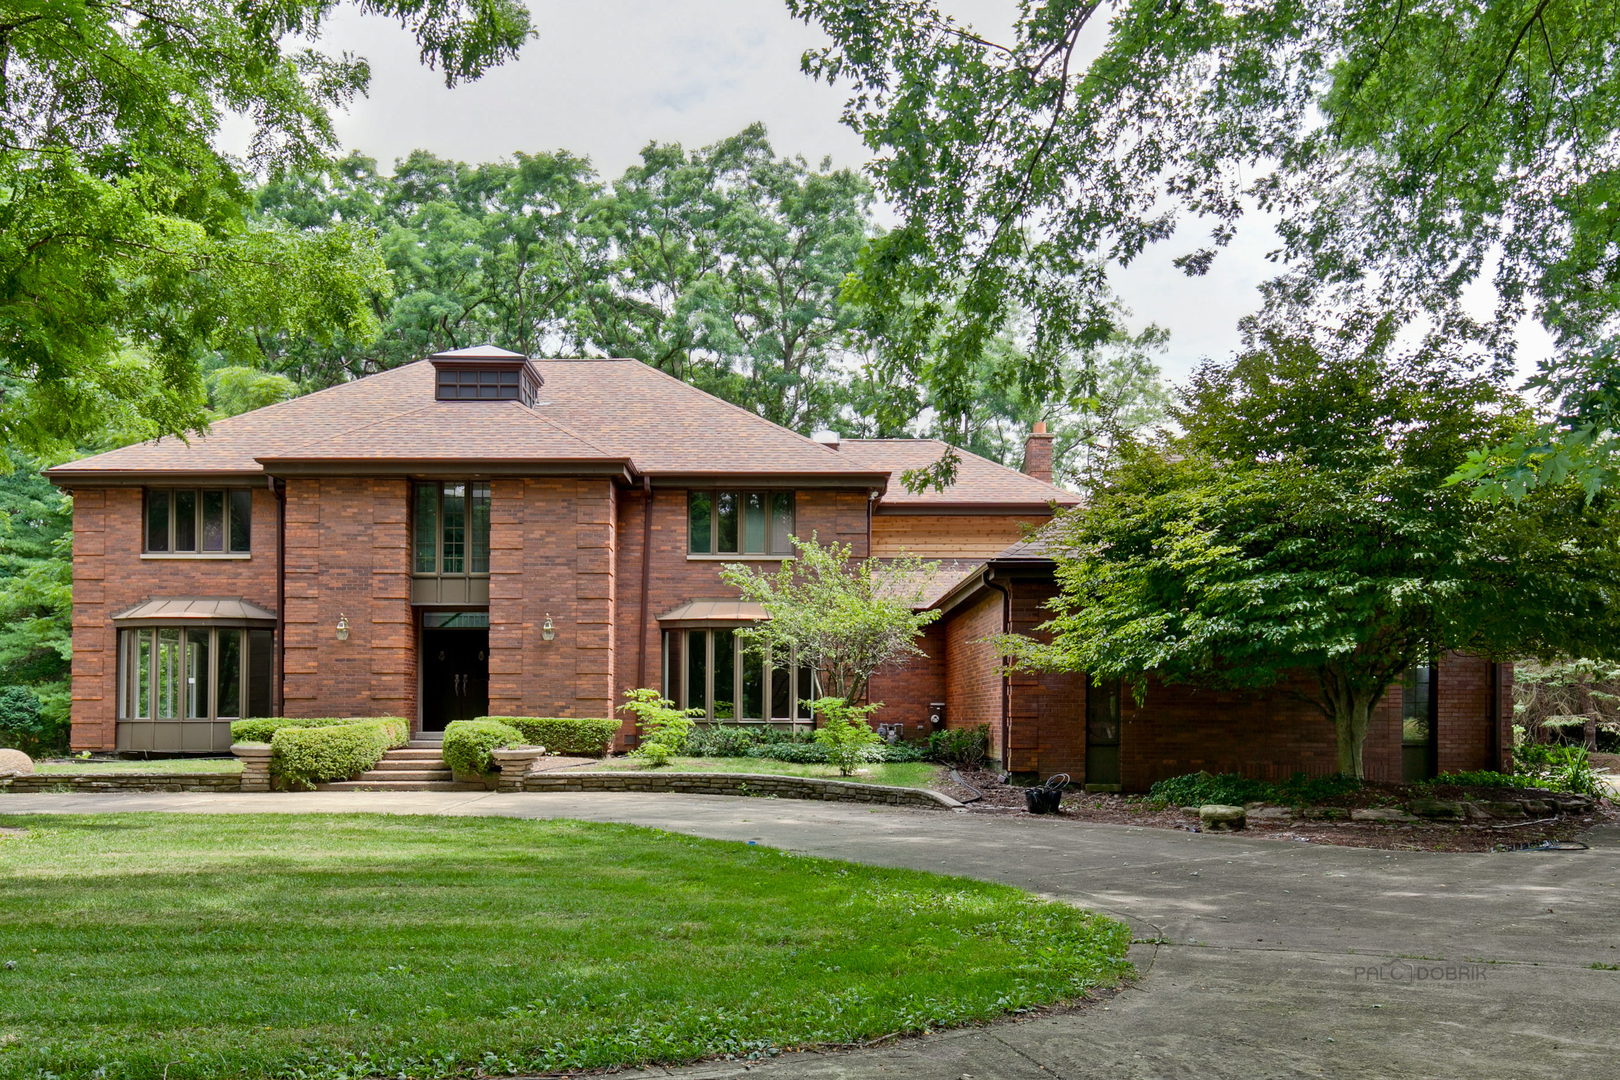 3326 Country Lane, Long Grove, Illinois 60047